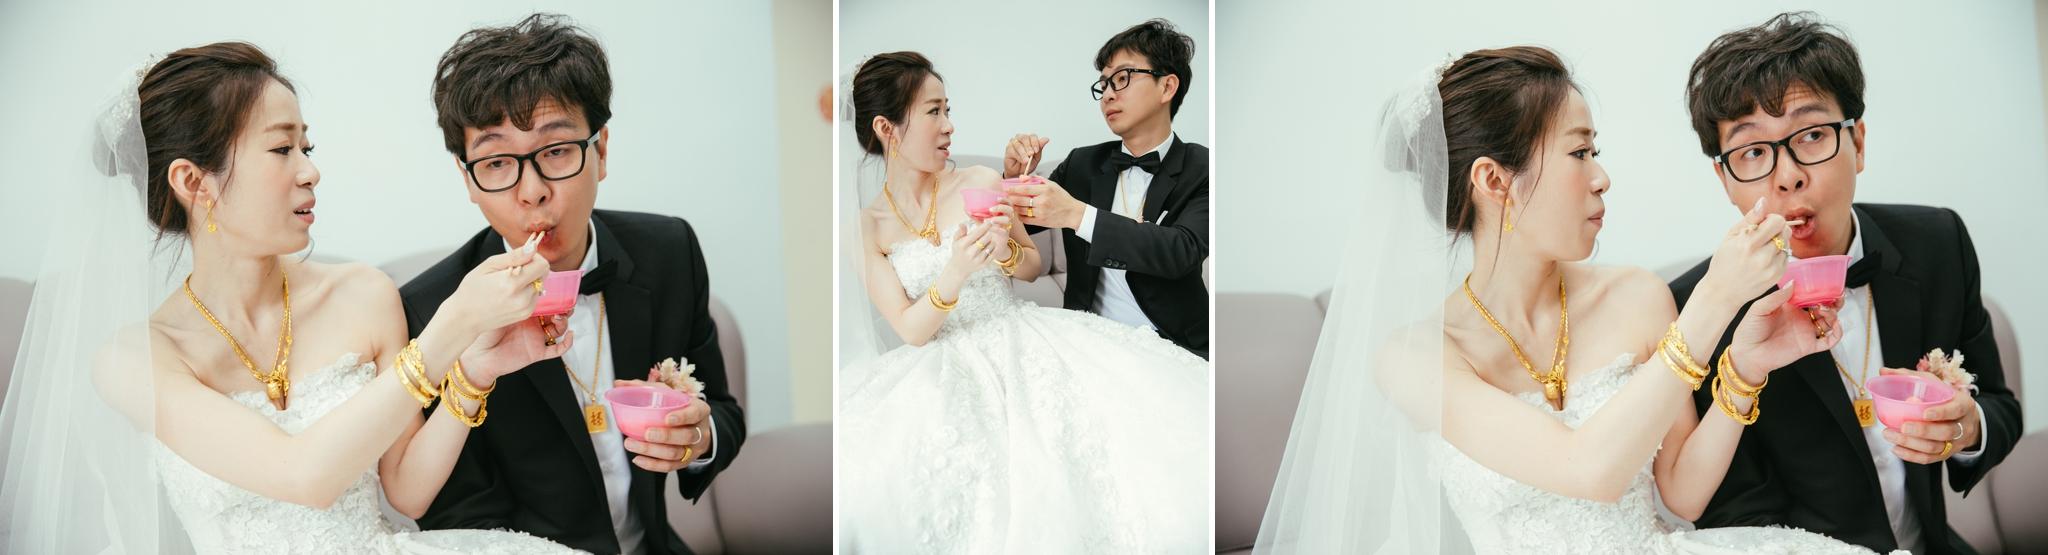 Tina+Nash-wedding-台北婚禮迎娶晚宴-新莊終身大事-099.jpg